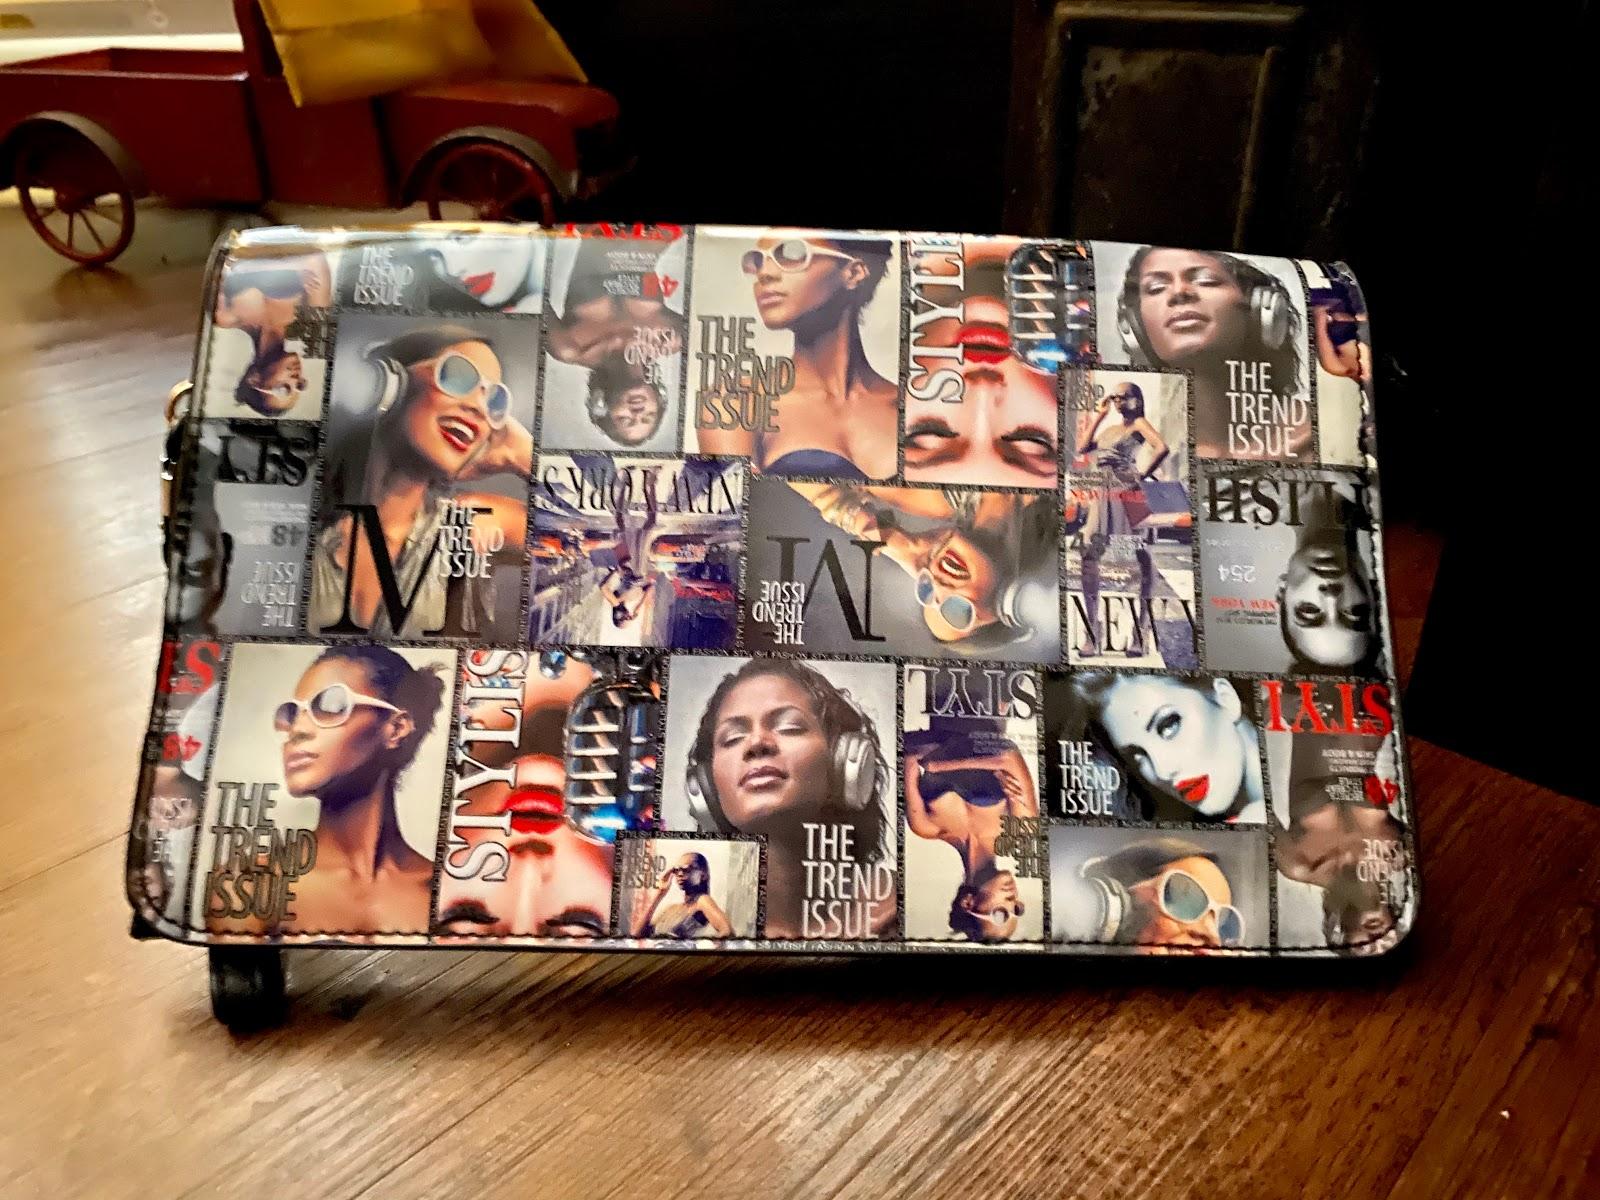 Magazine clutch handbag. Accessories That Look Good On Women: Thrift Bits And Favorites